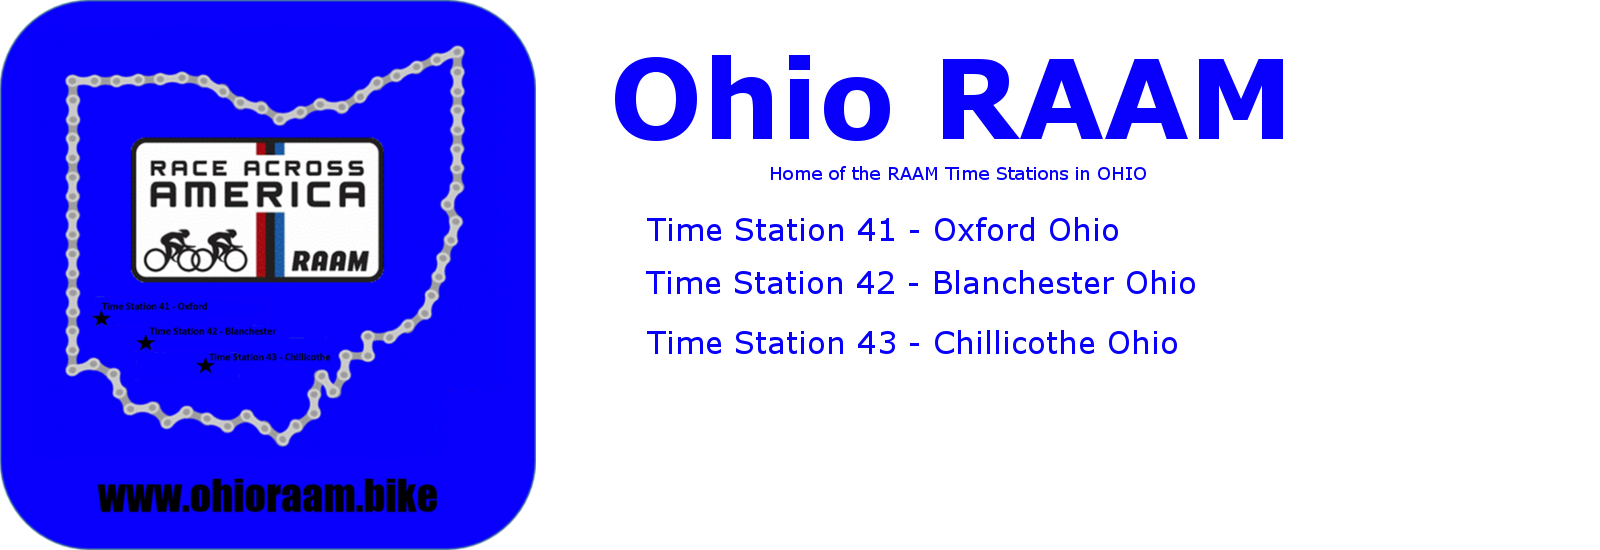 Ohio RAAM Time Stations